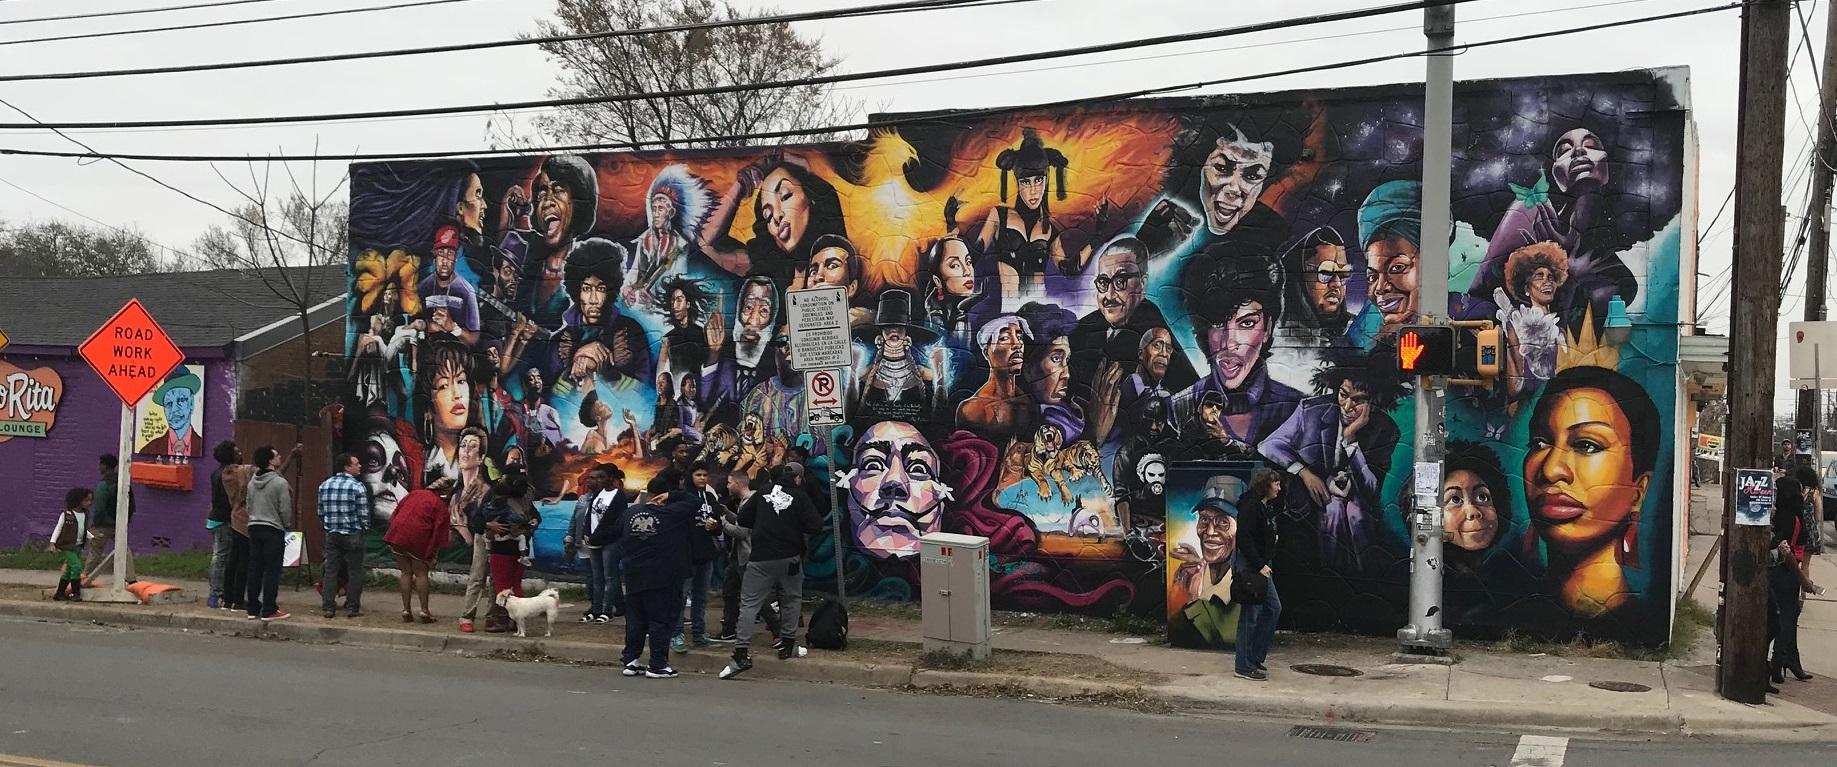 east austin mural2_638750